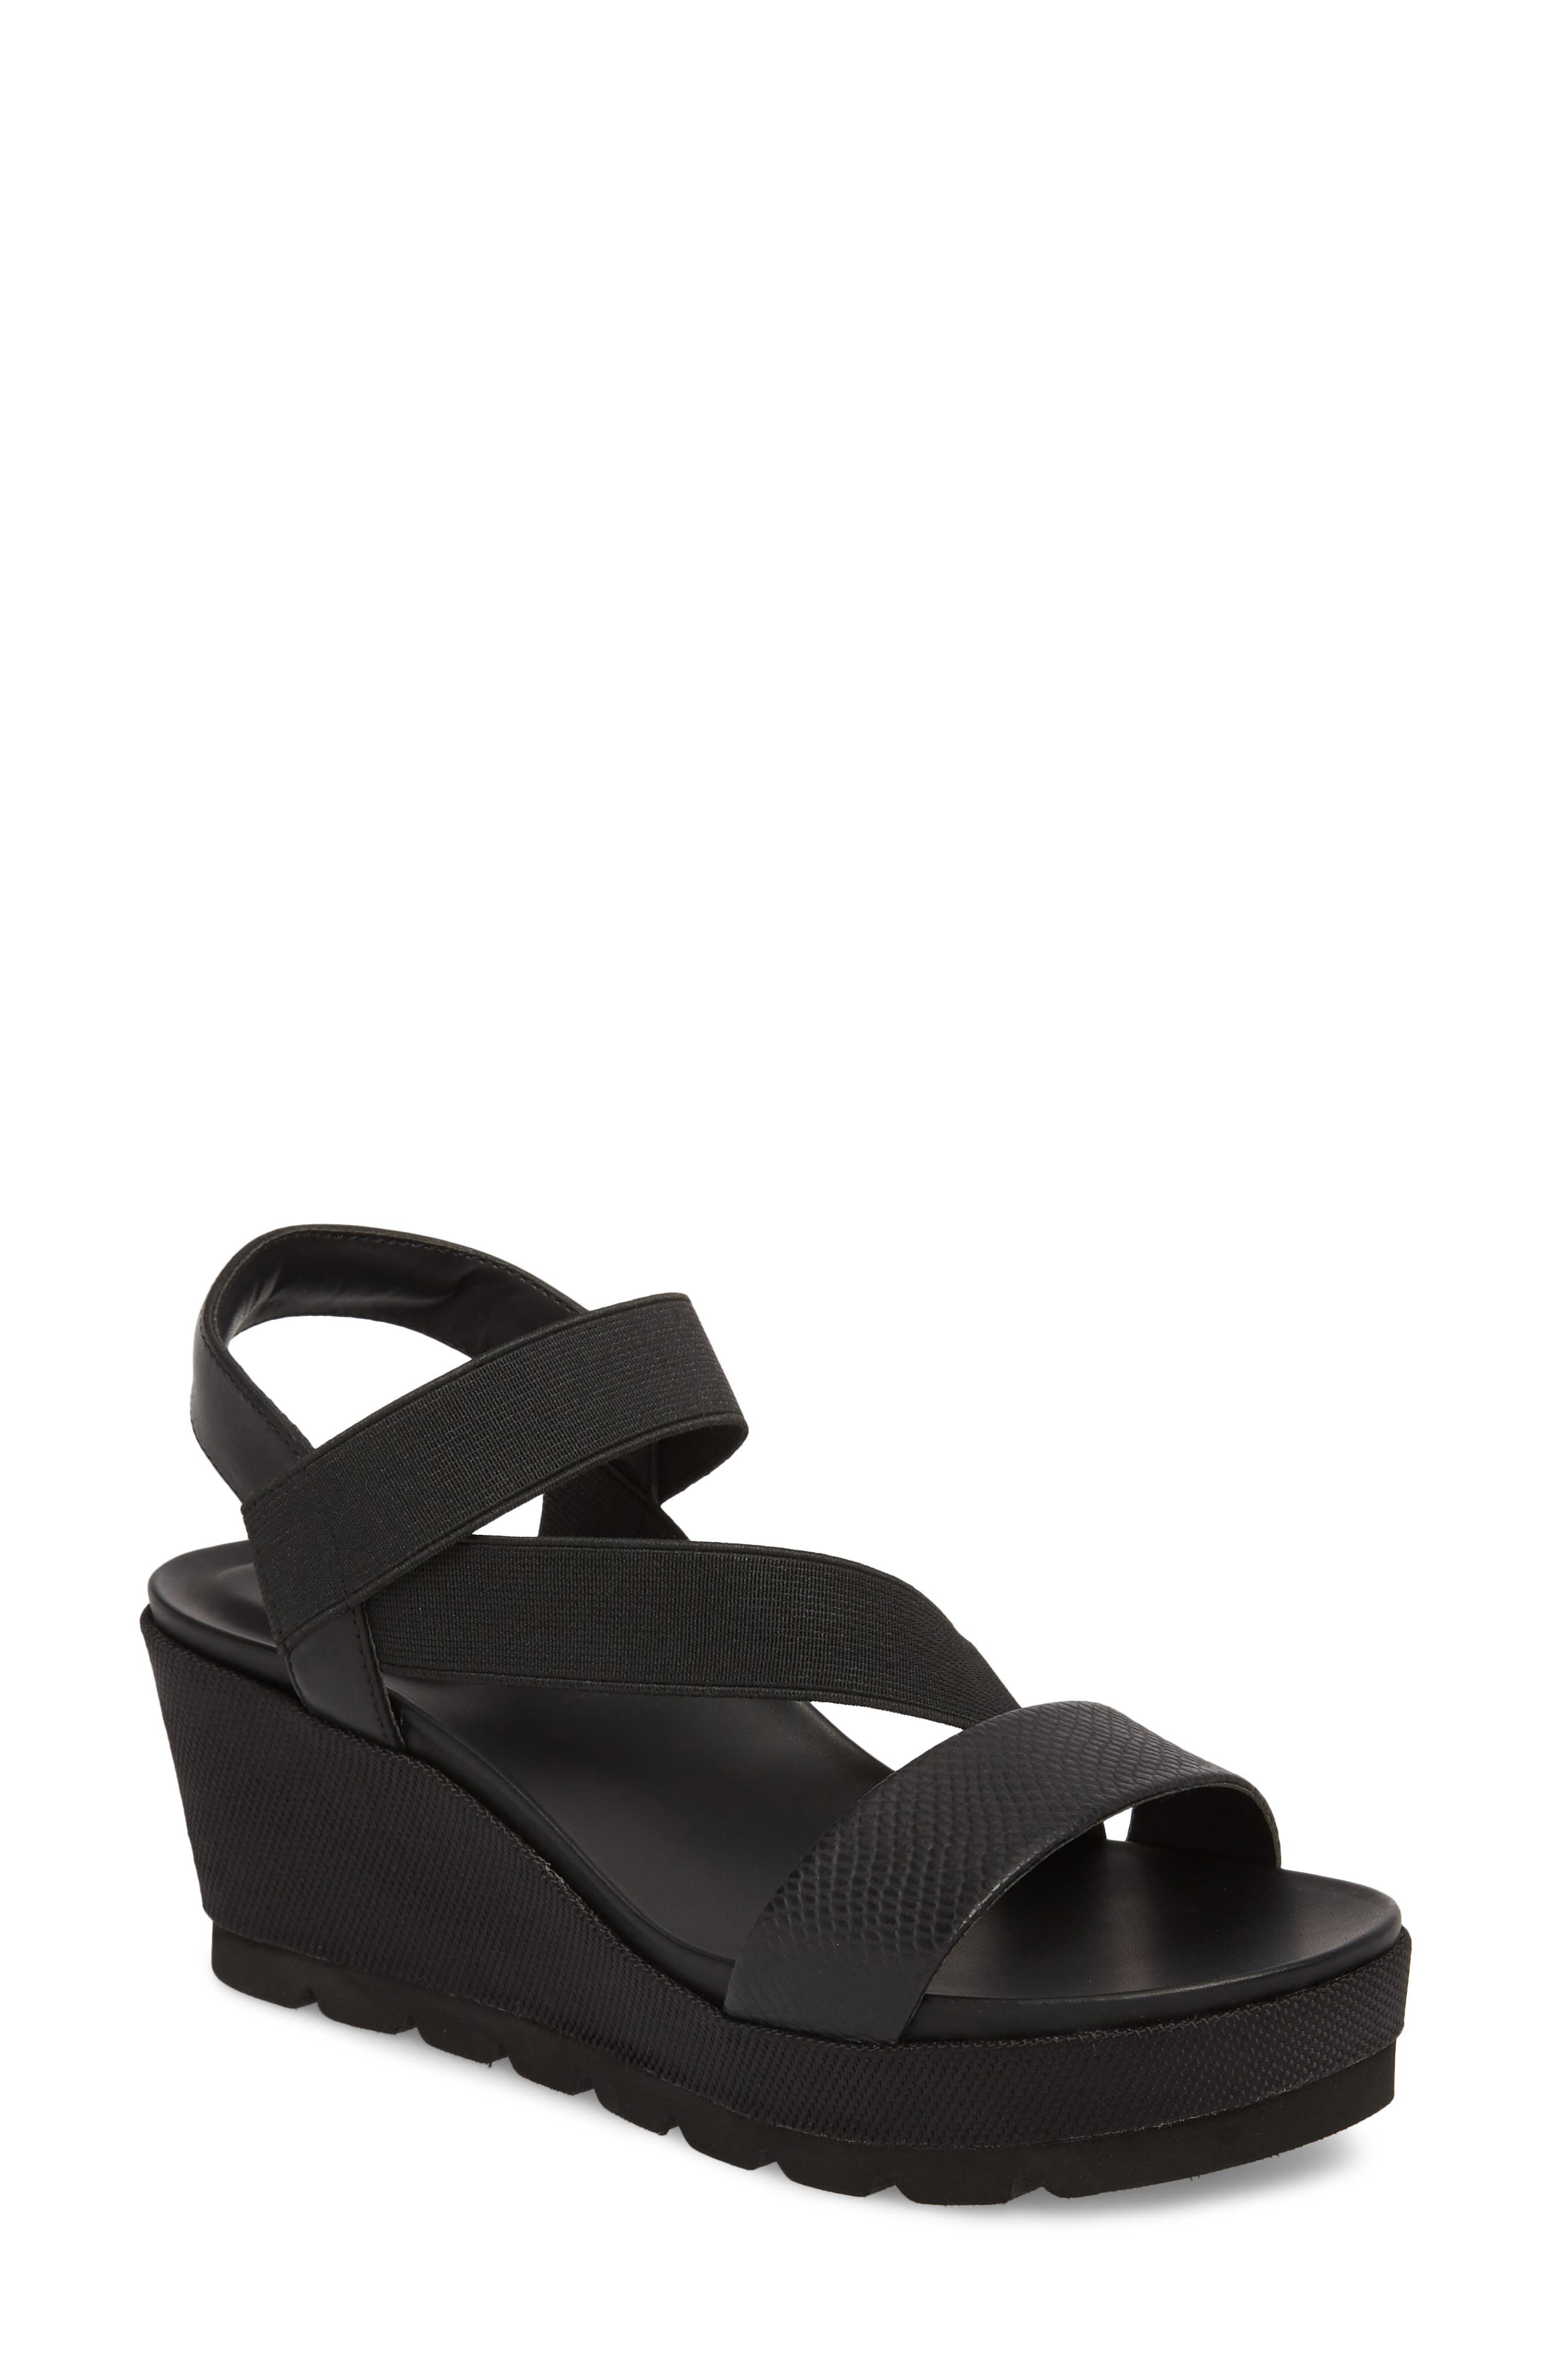 TT-Gabel Sandal,                             Main thumbnail 1, color,                             Black Leather